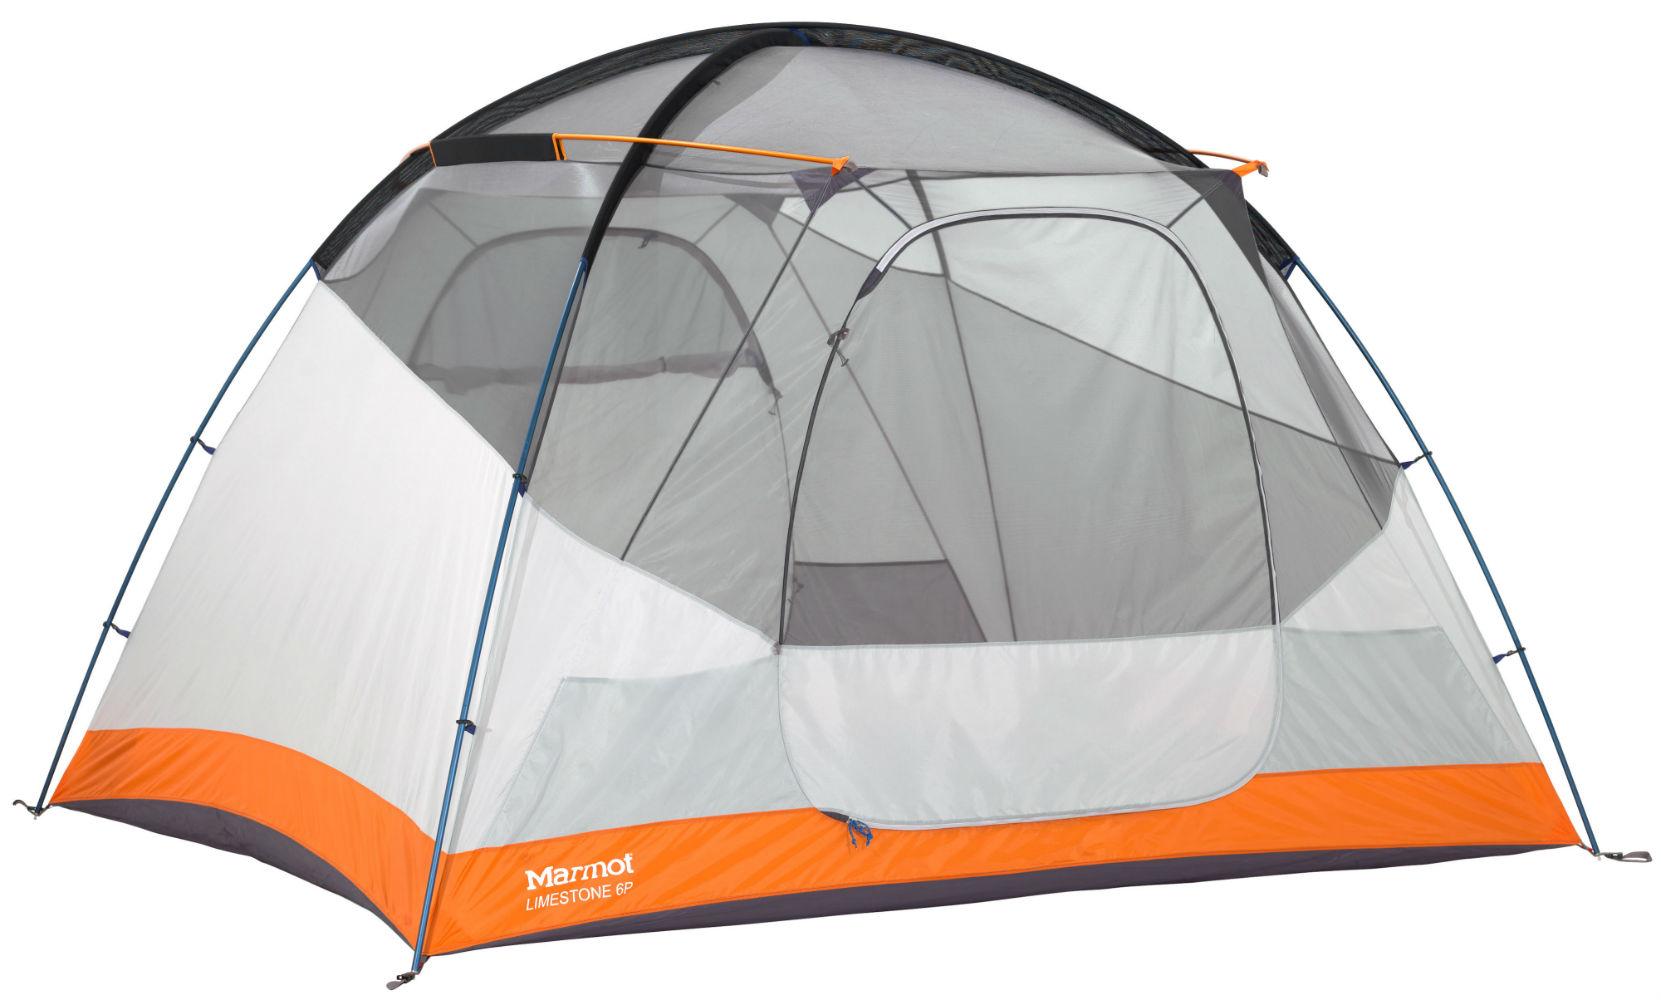 sc 1 st  C&Saver.com & Marmot Limestone 6 Tent - 6 Person 3 Season with Free Su0026H u2014 CampSaver